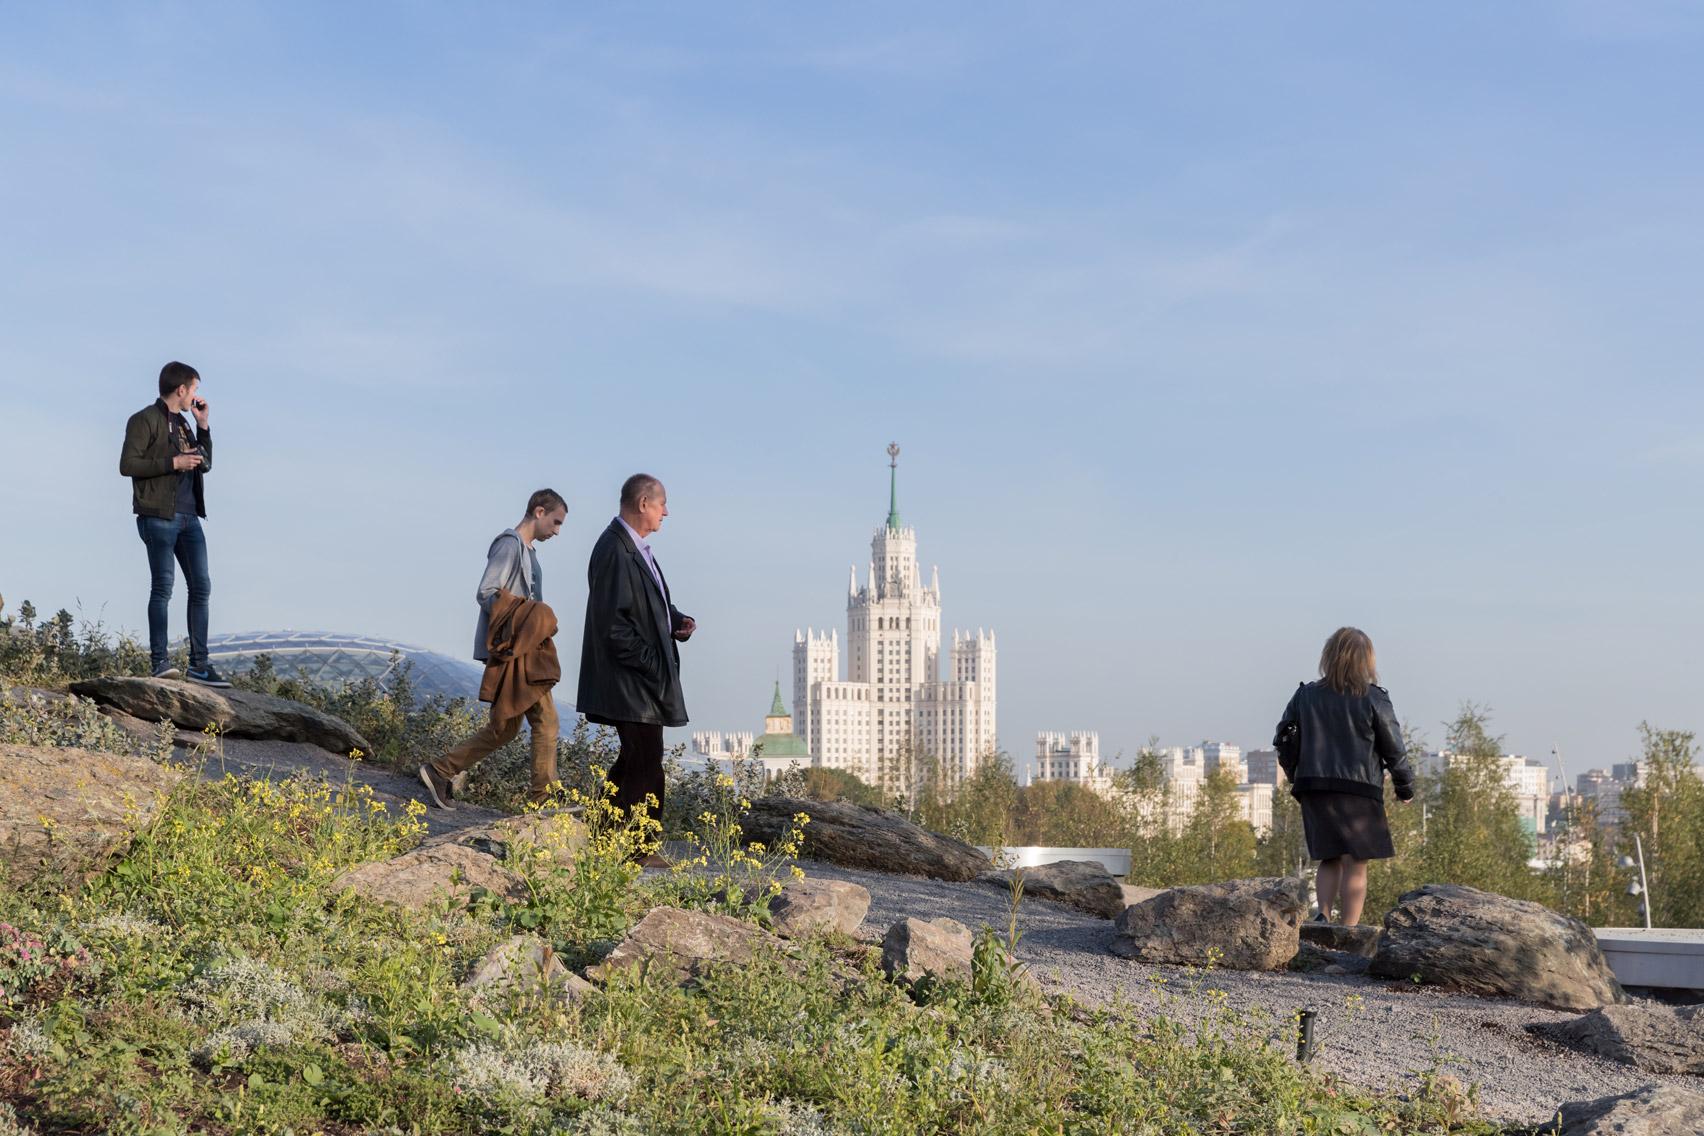 Landscaped gardens Zaryadye Park in Moscow